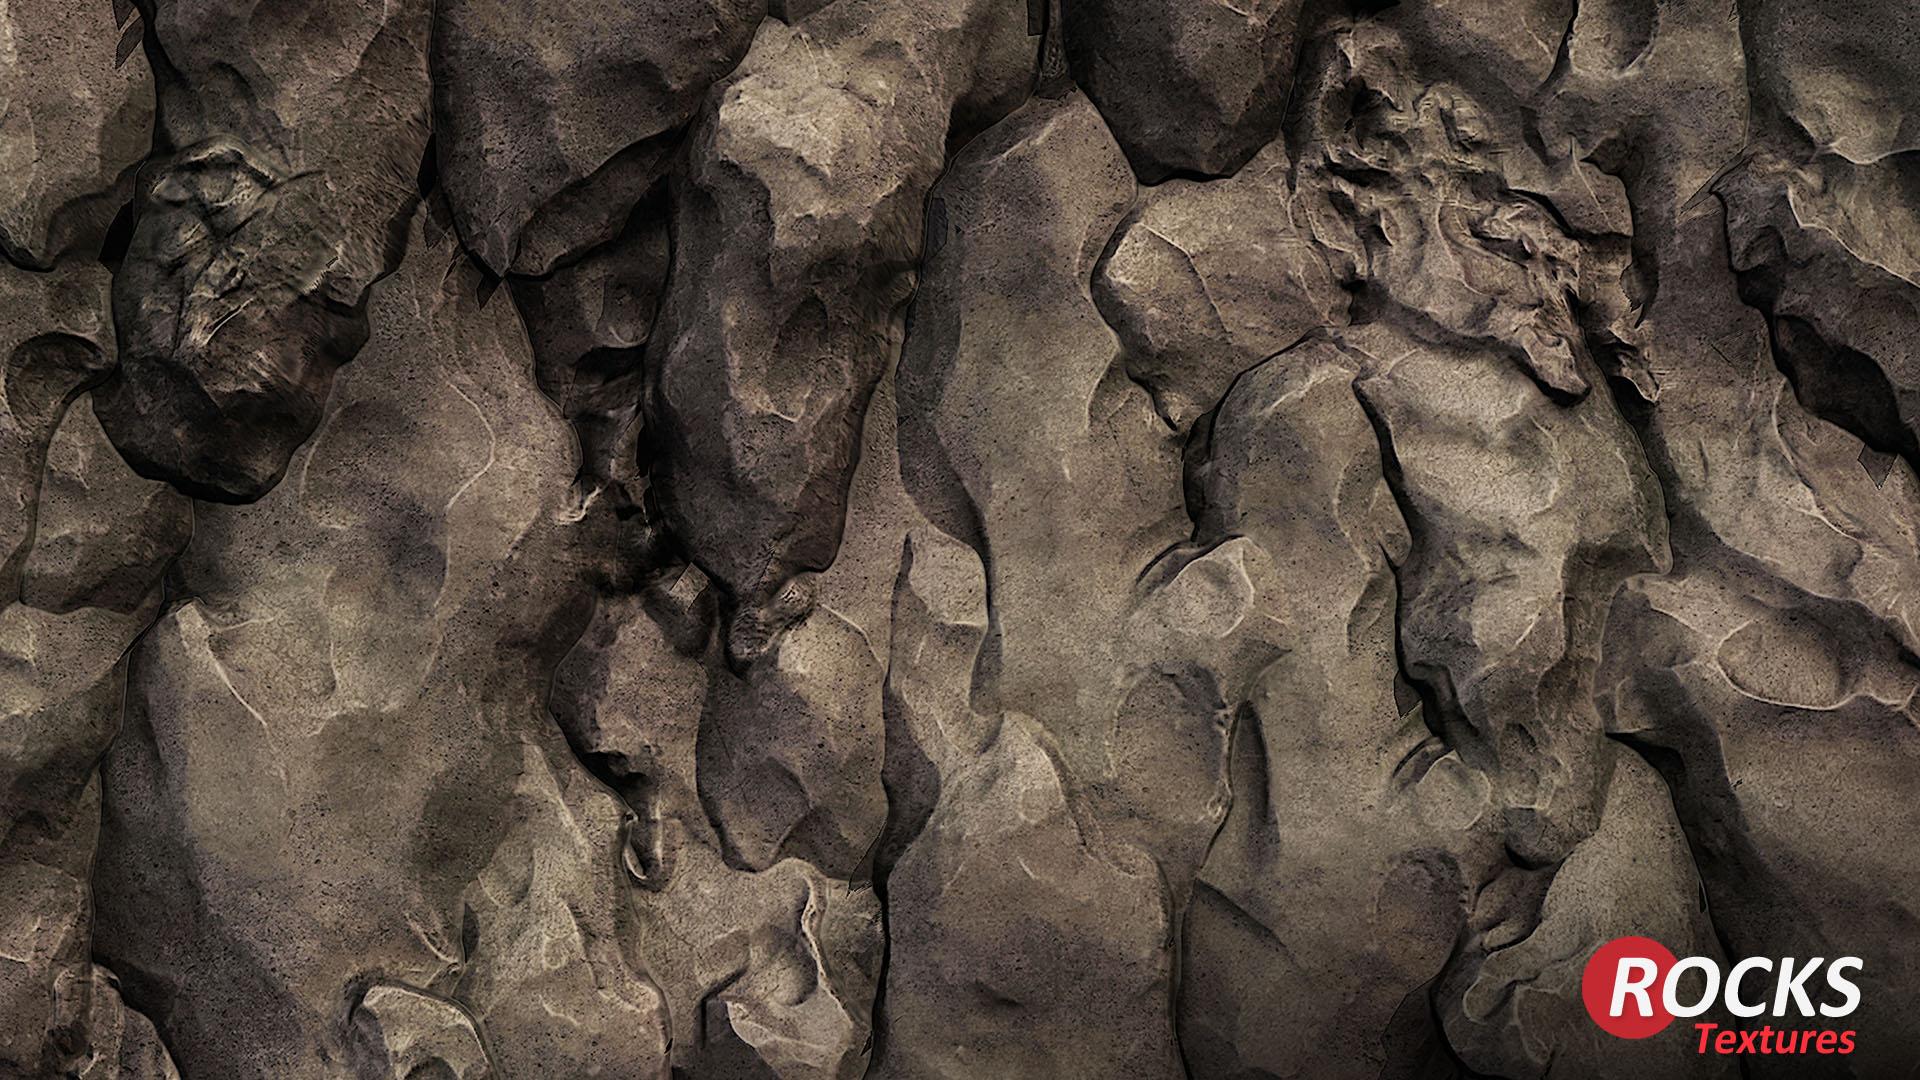 rock_stone_sculpted_textures_01.jpg